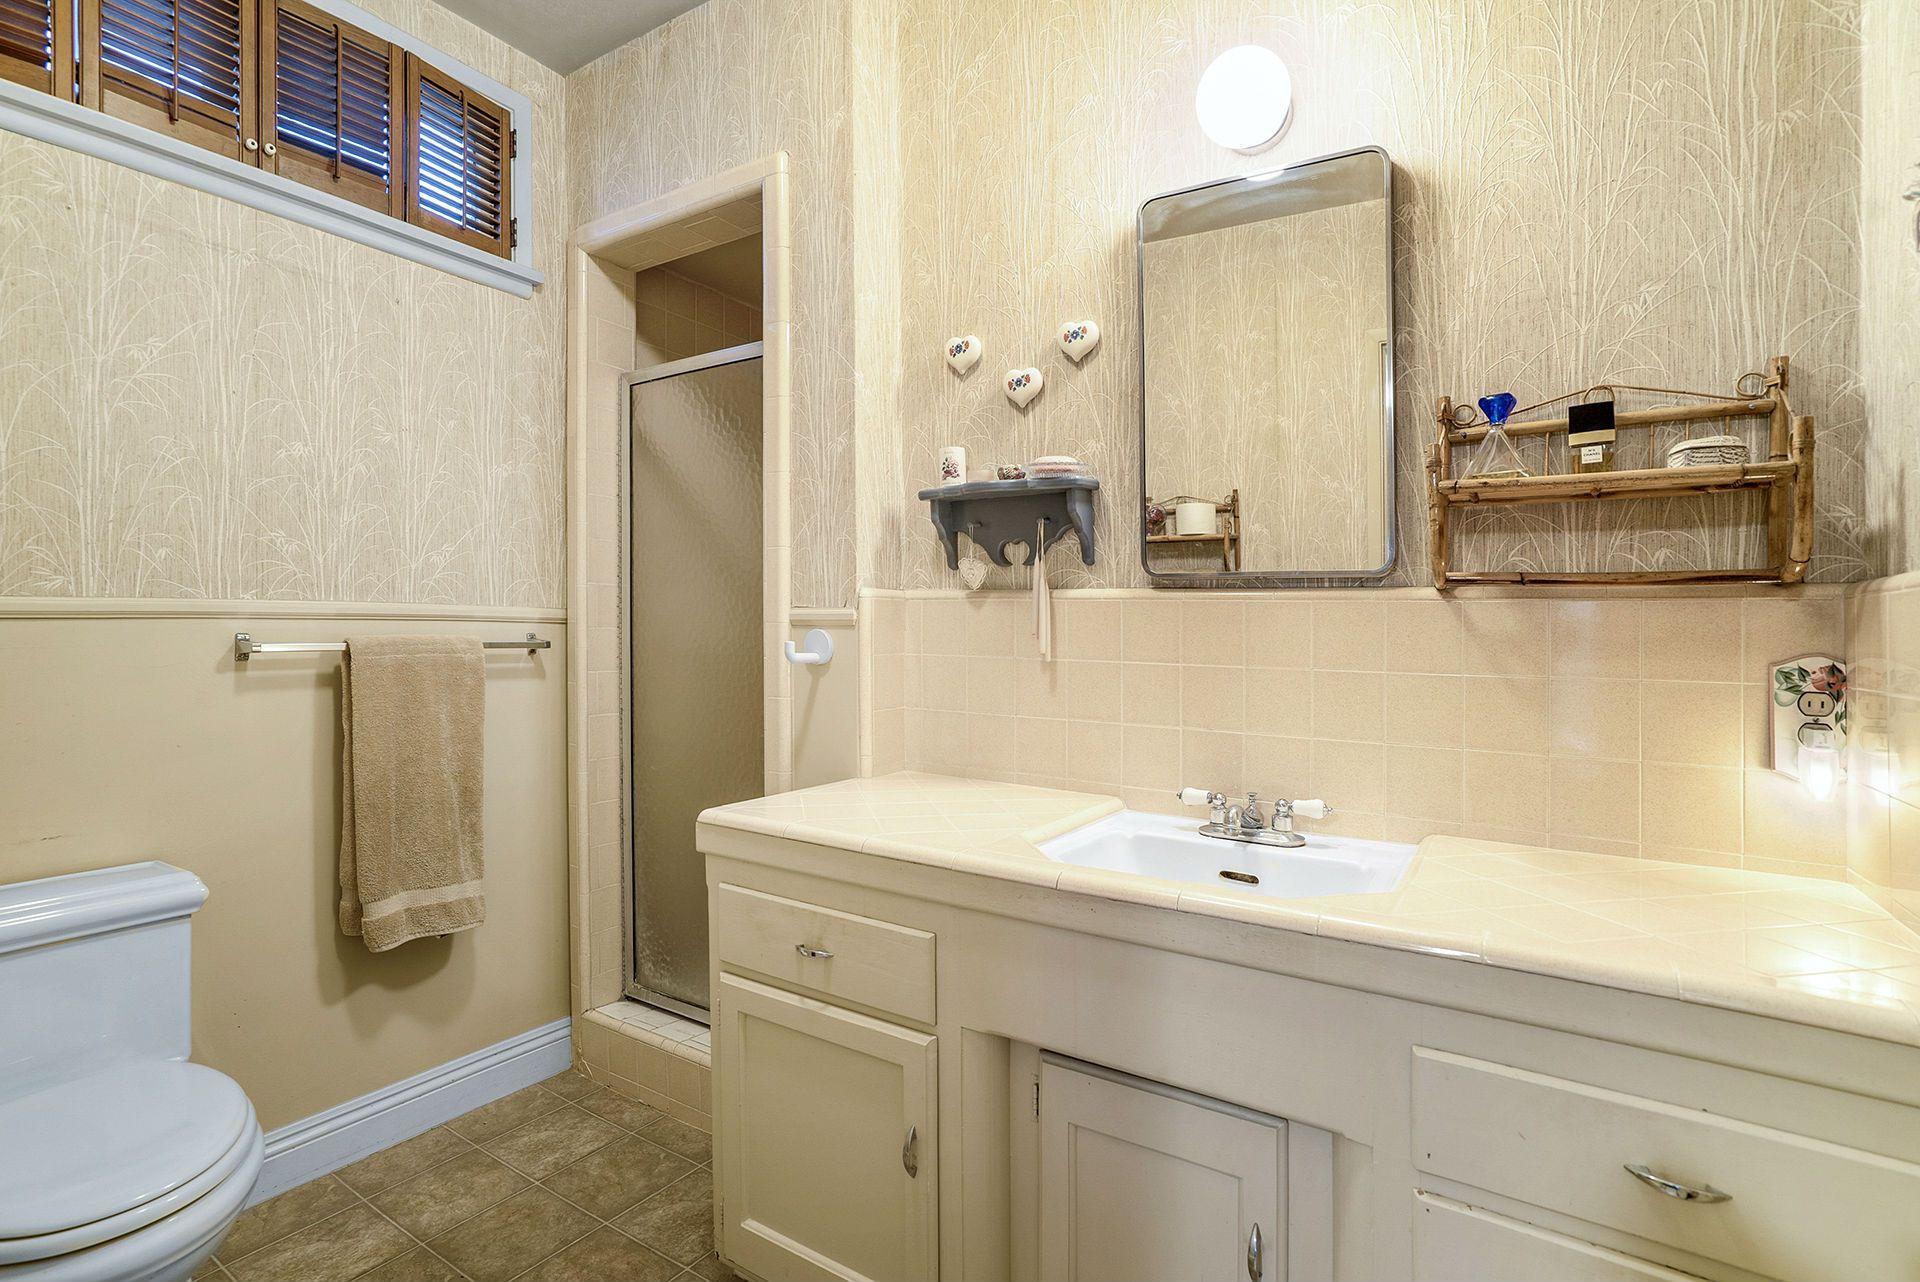 Master bathroom with shower (no tub).